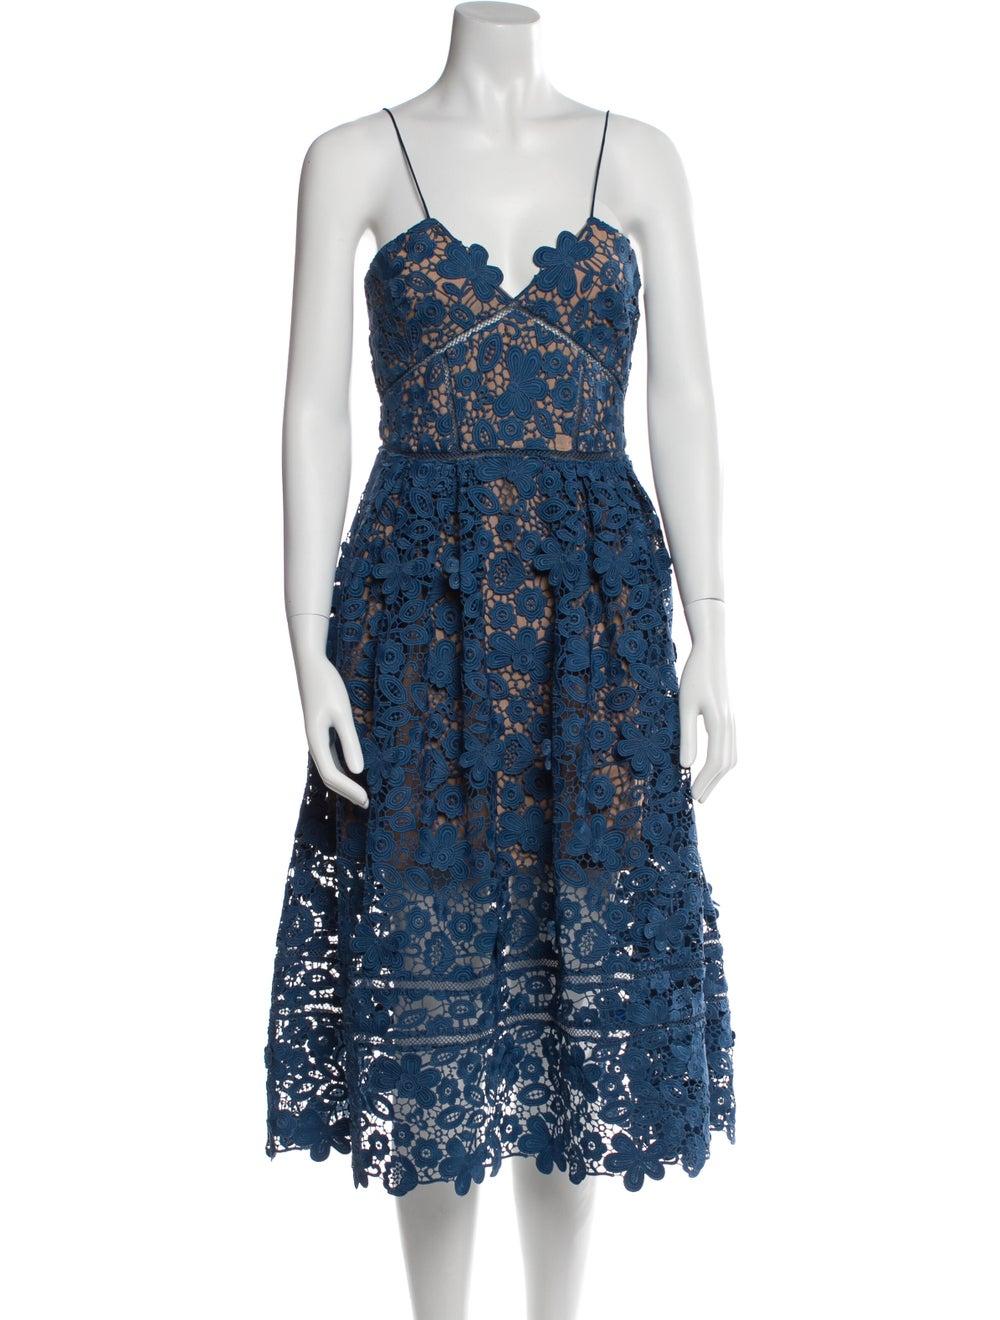 Self-Portrait Lace Pattern Midi Length Dress Blue - image 1